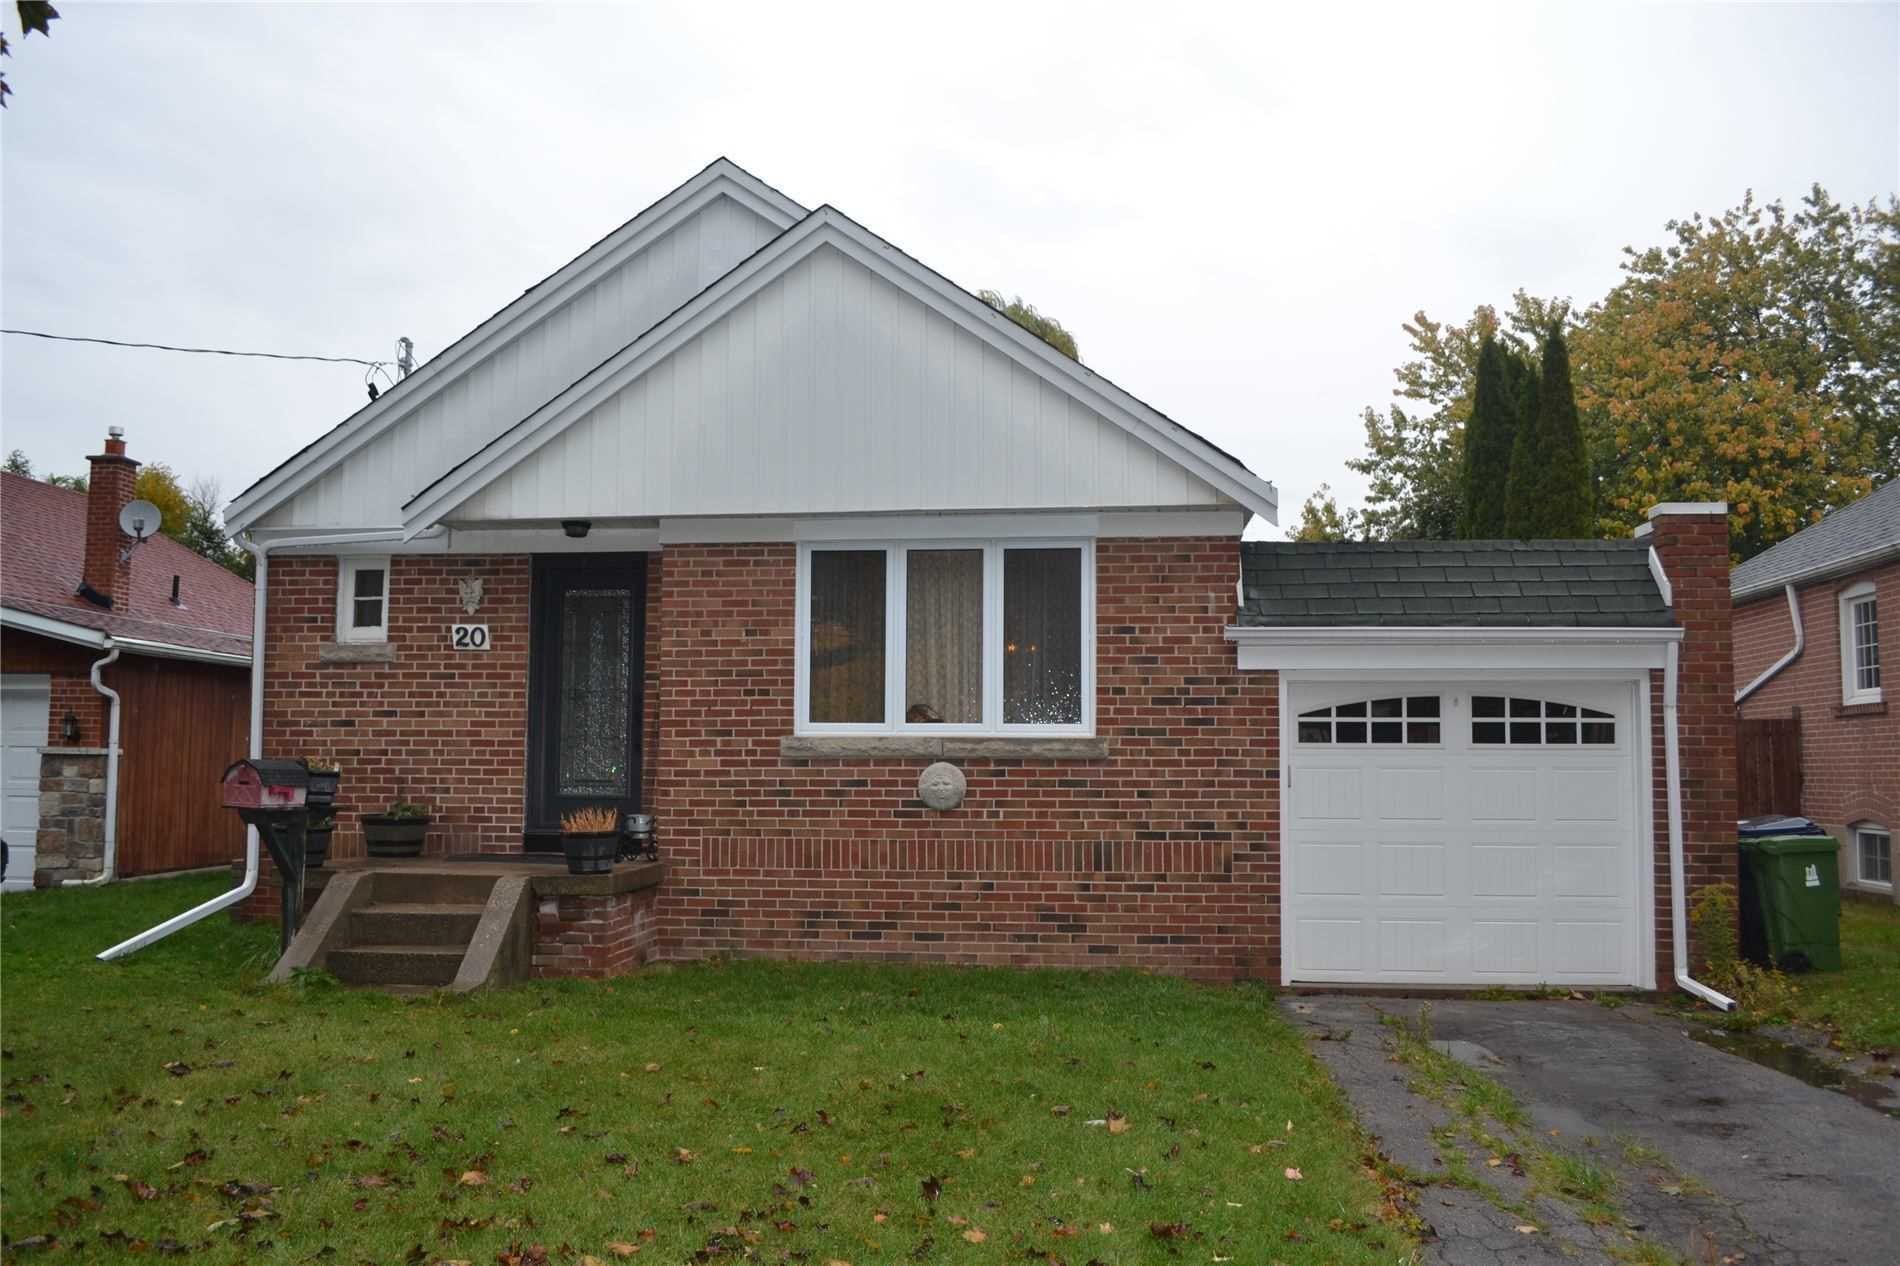 20 Ridgemoor Ave, Toronto, Ontario M1N1M4, 3 Bedrooms Bedrooms, 6 Rooms Rooms,2 BathroomsBathrooms,Detached,For Sale,Ridgemoor,E4961574